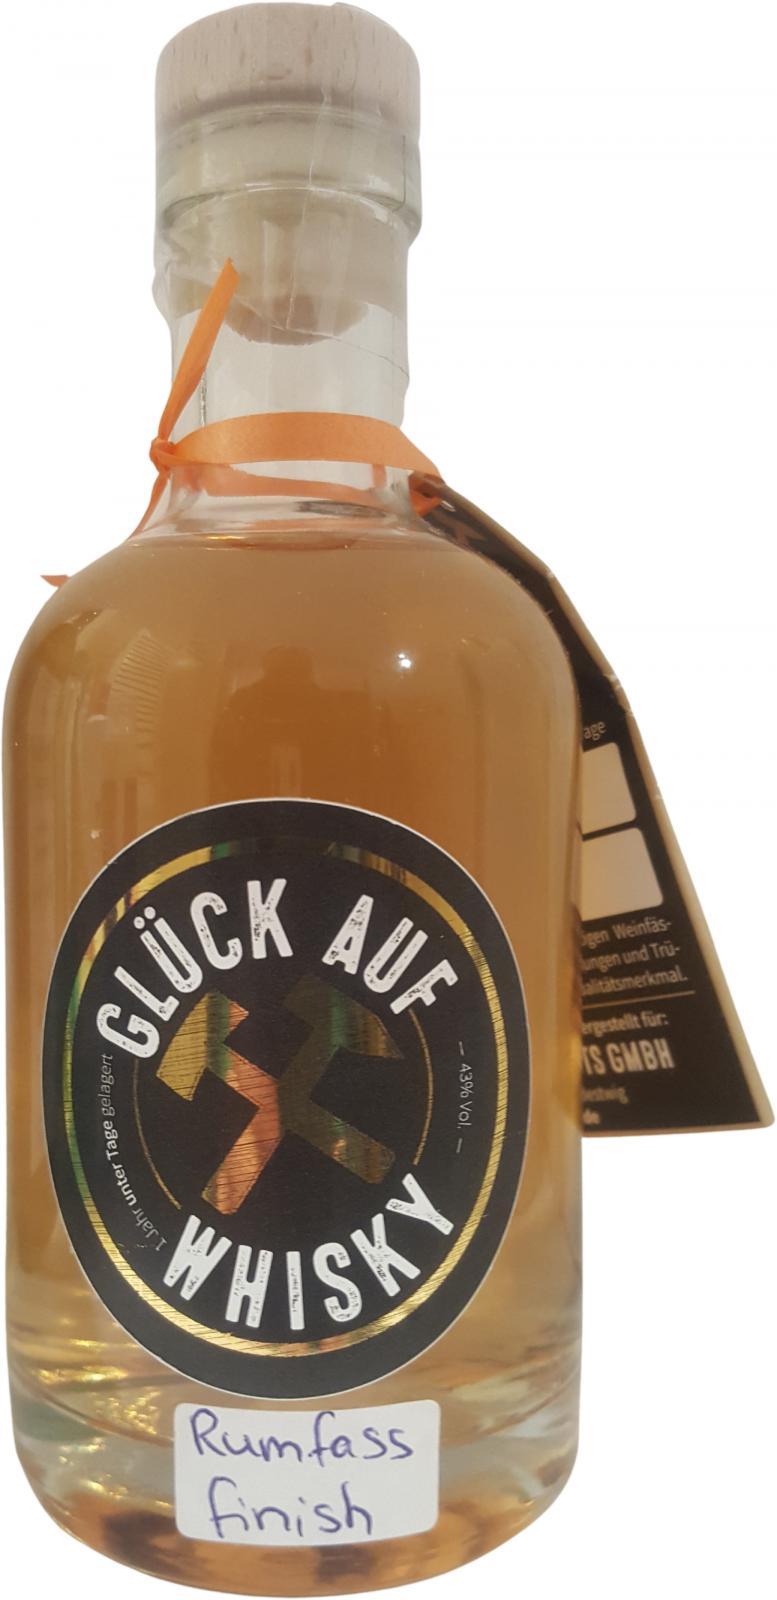 Glück Auf Whisky 03-year-old